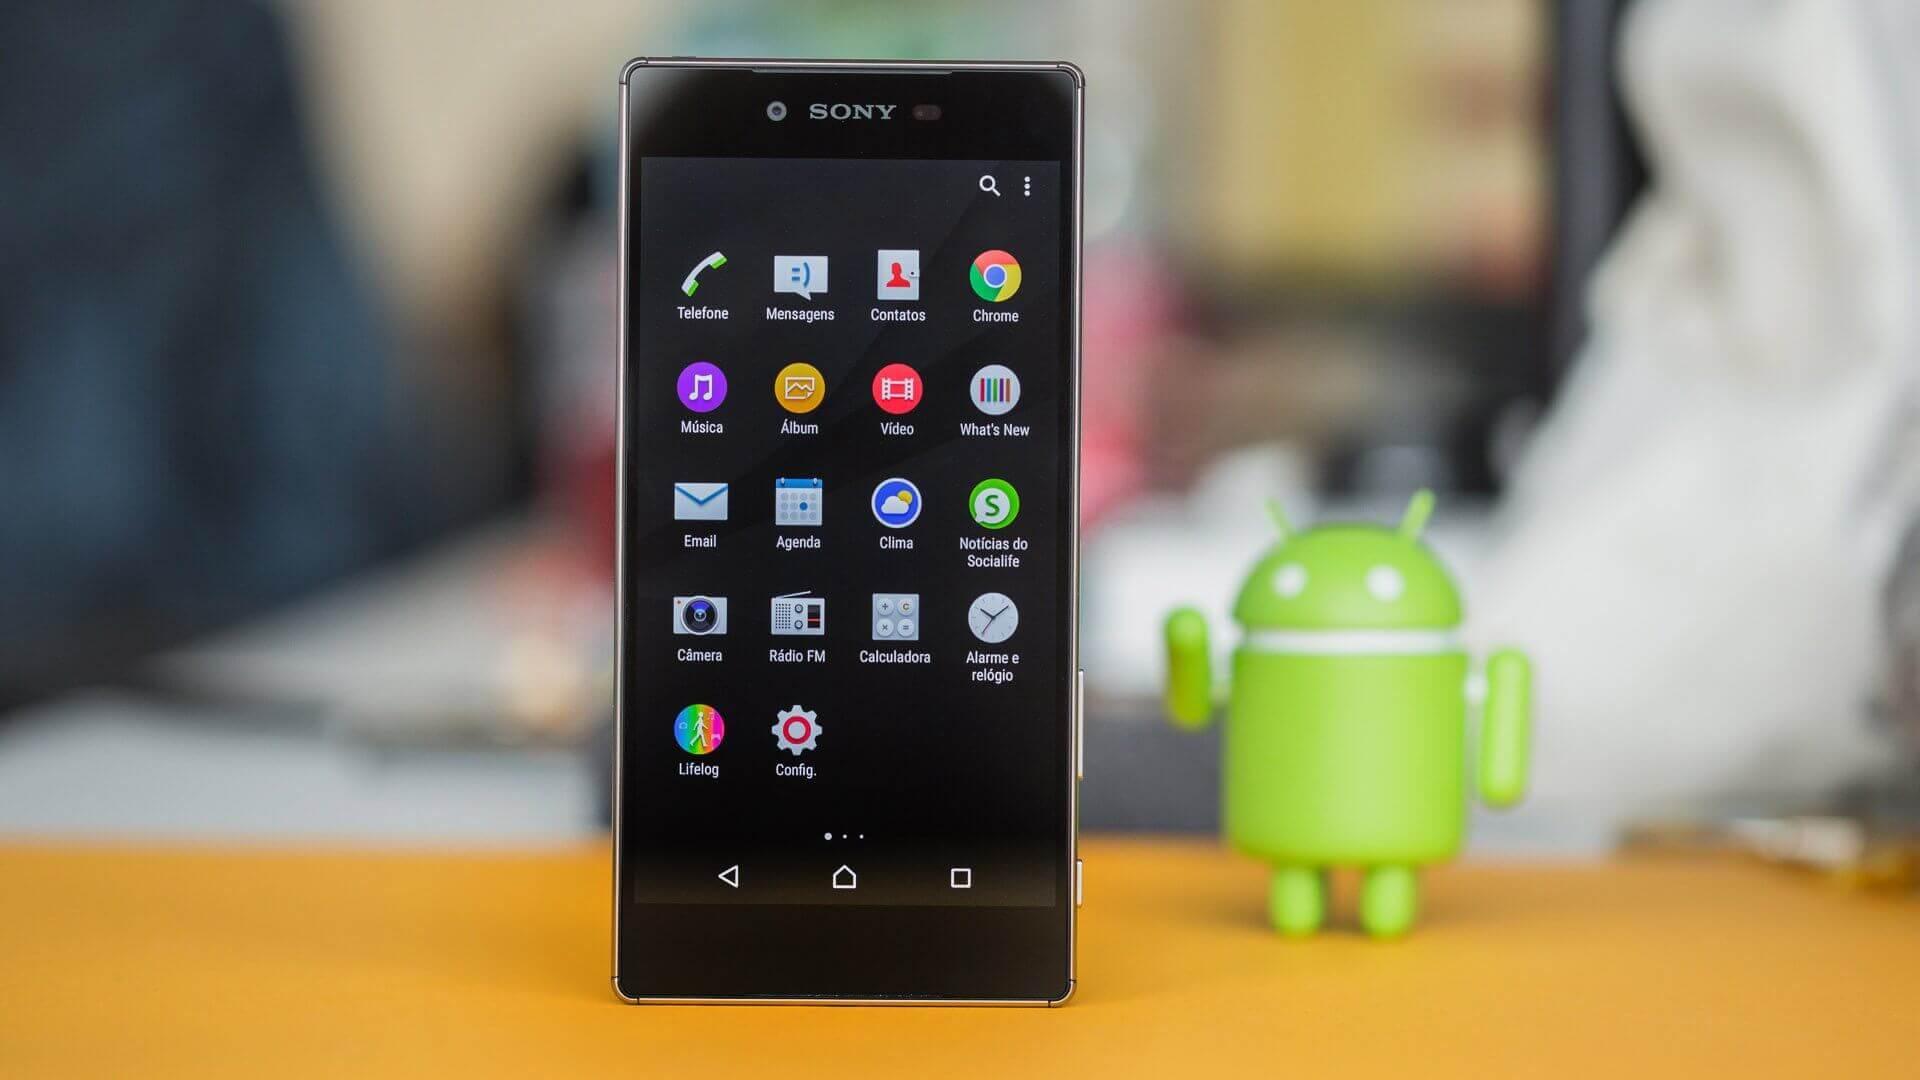 Install Android 7.1.1 MROM 2.8 Nougat Custom ROM on Xperia Z5 Premium